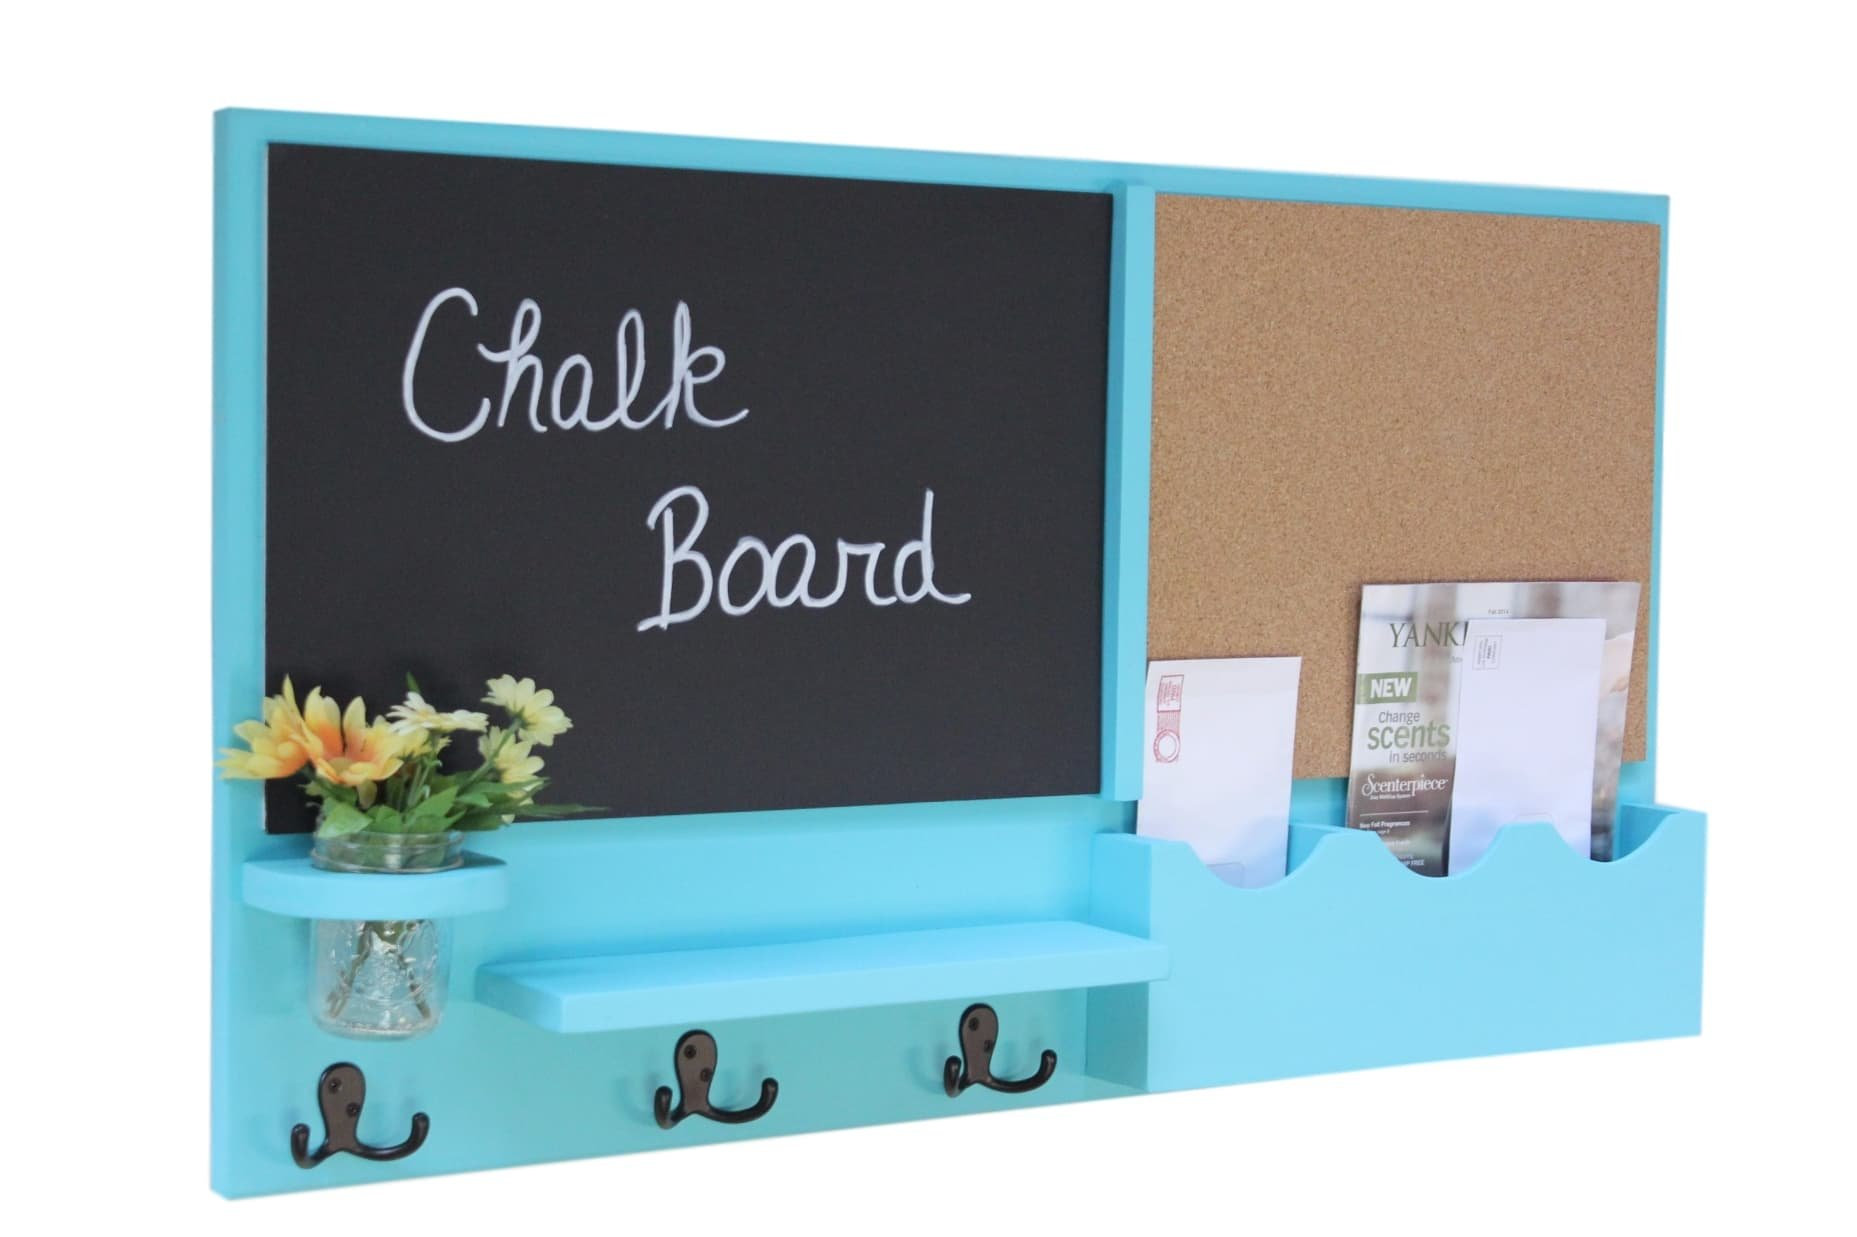 Legacy Studio Décor Message Center with Chalkboard Cork Board Mail Organizer Key Hooks Coat Hooks Mason Jar (Smooth, Turquoise)